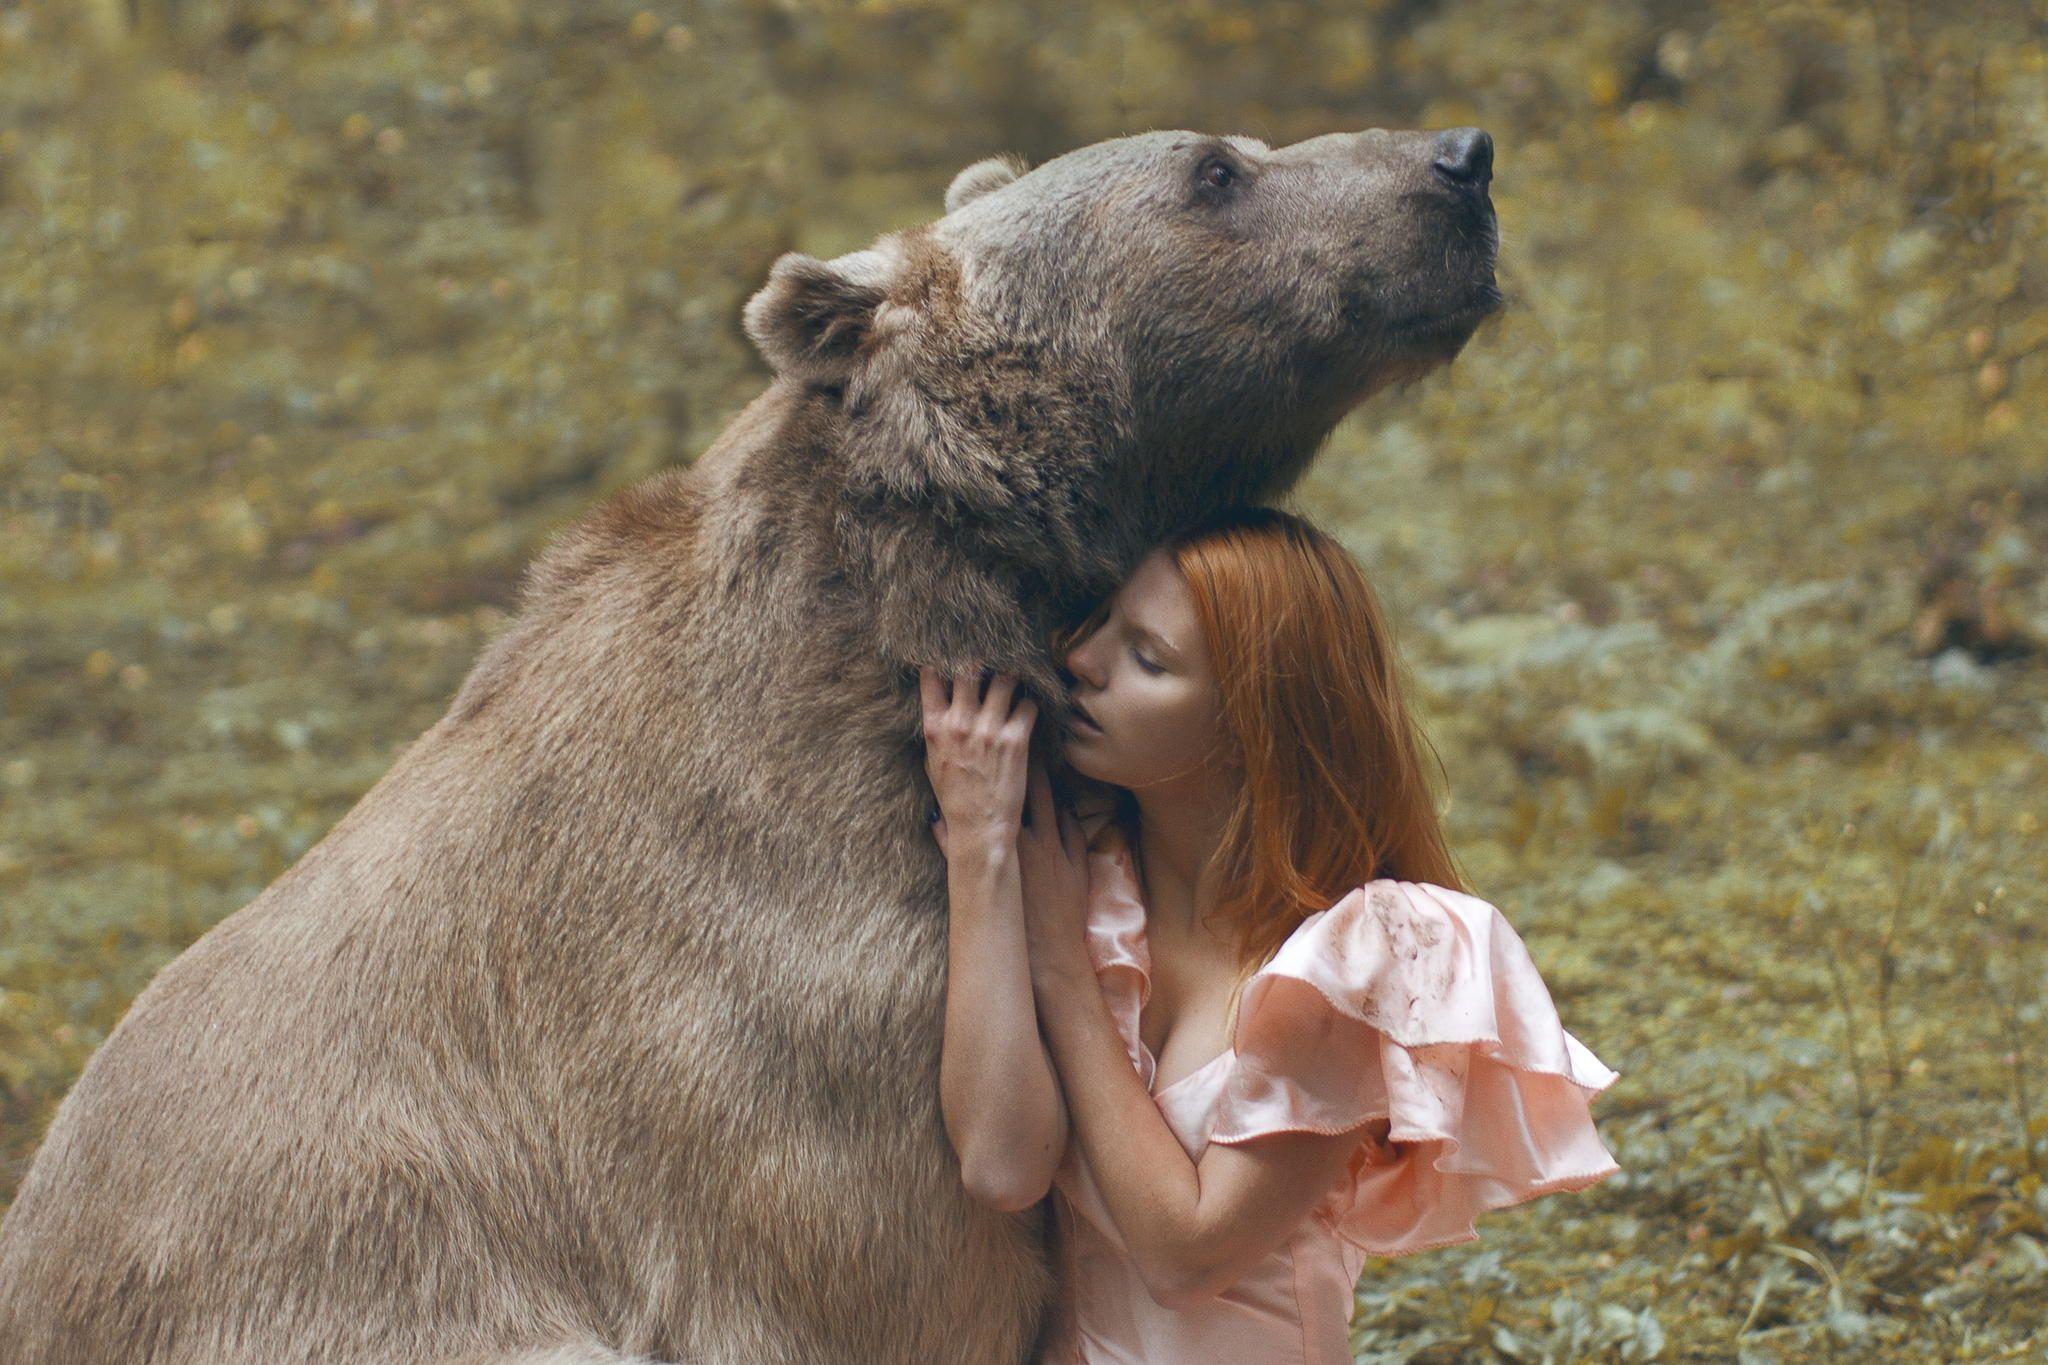 Photograph Untitled By Katerina Plotnikova On Px Fantasy - Russian photographer takes enchanting fairytale photos featuring wild animals